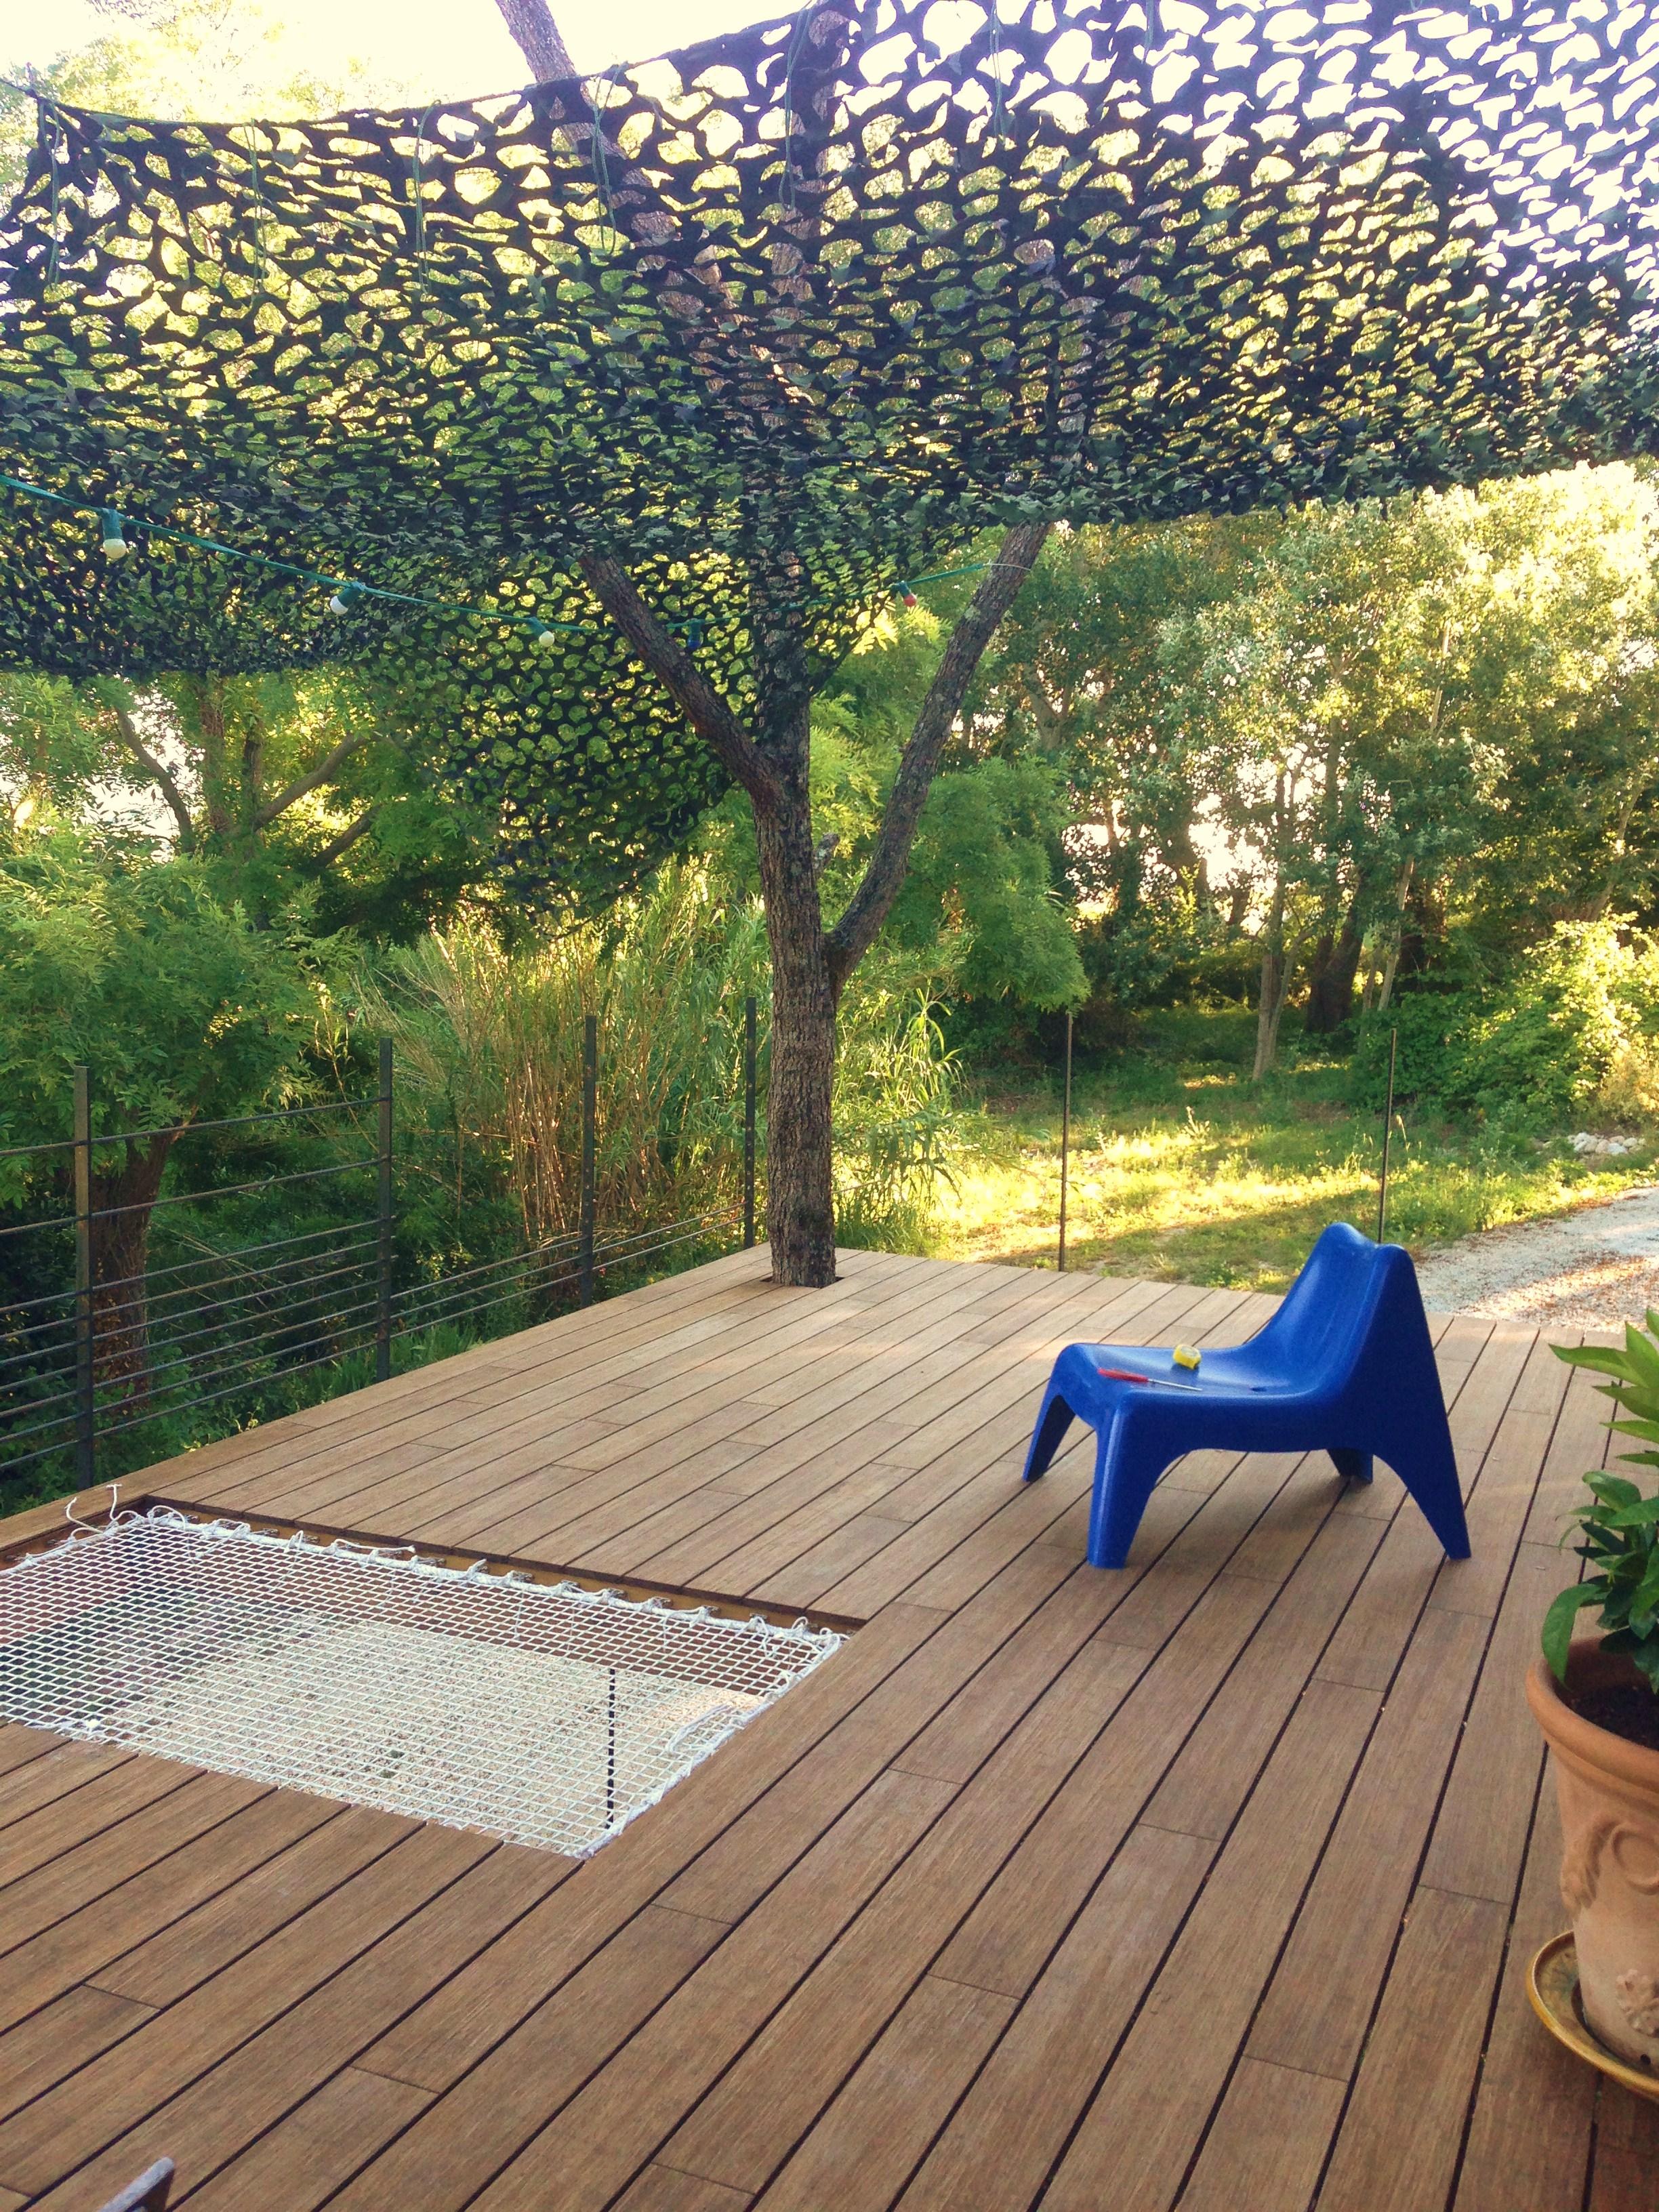 terrasse-bambou-la-font-du-figuier-2016 – emile montaudouin